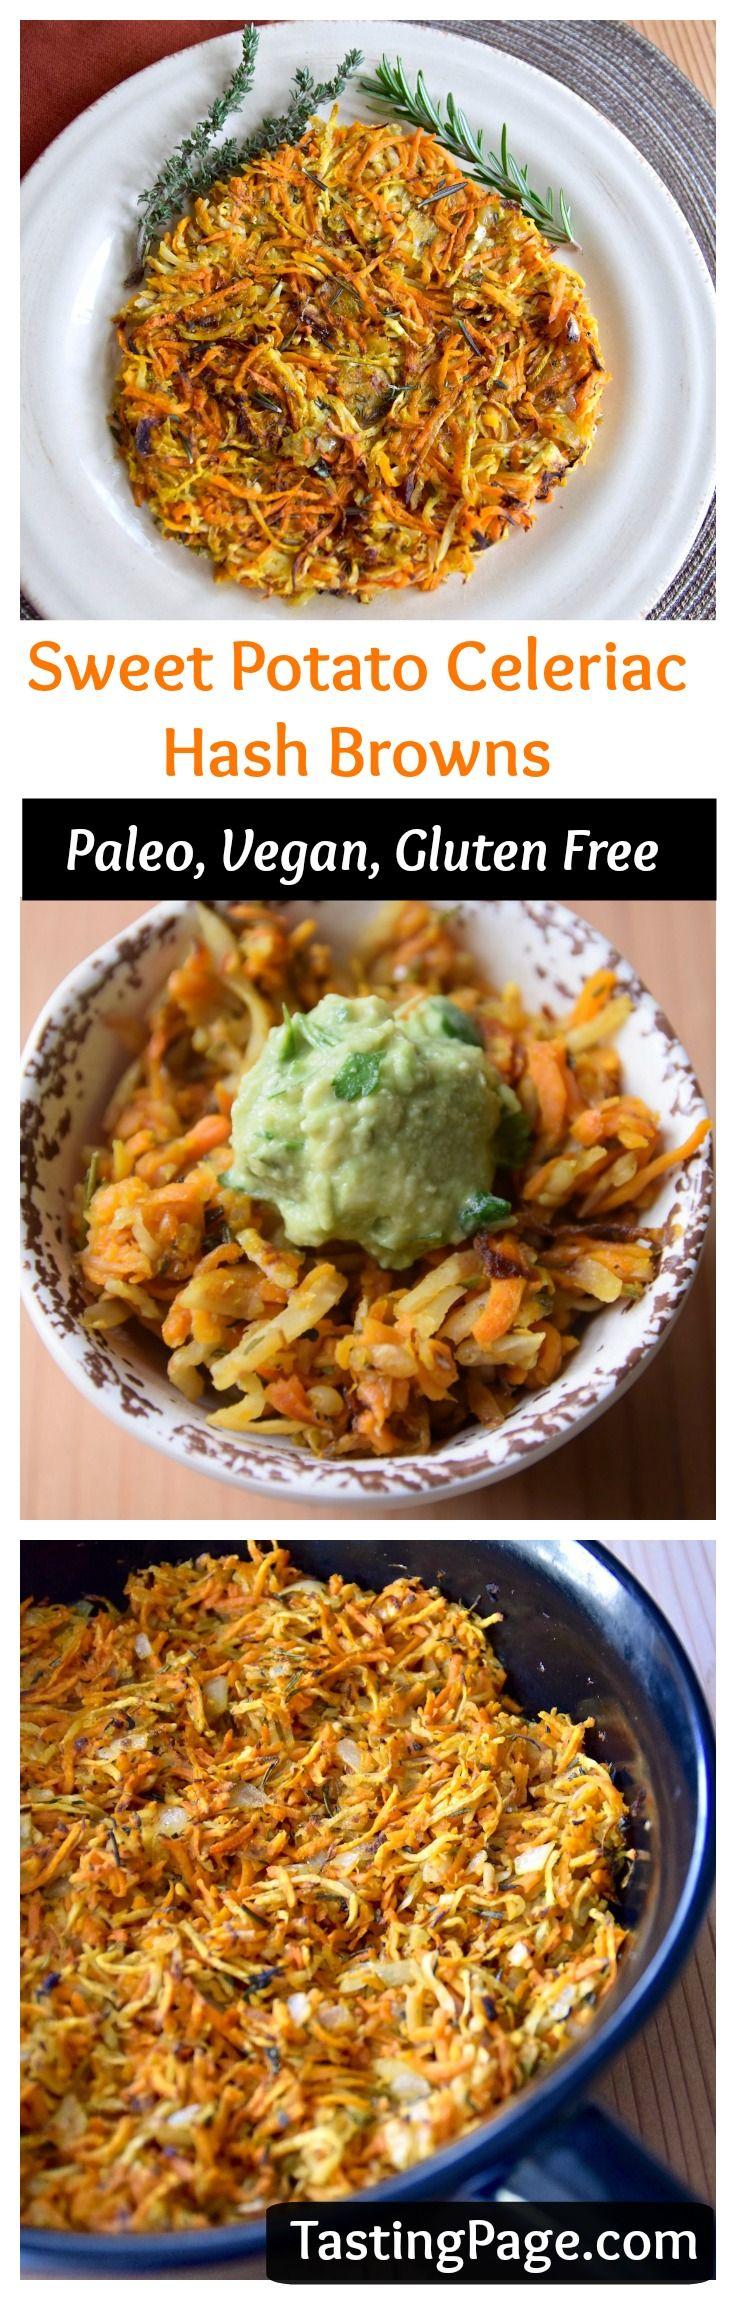 Sweet Potato Celeriac Hash Browns - a great gluten free, vegan and paleo power breakfast to start your day | TastingPage.com